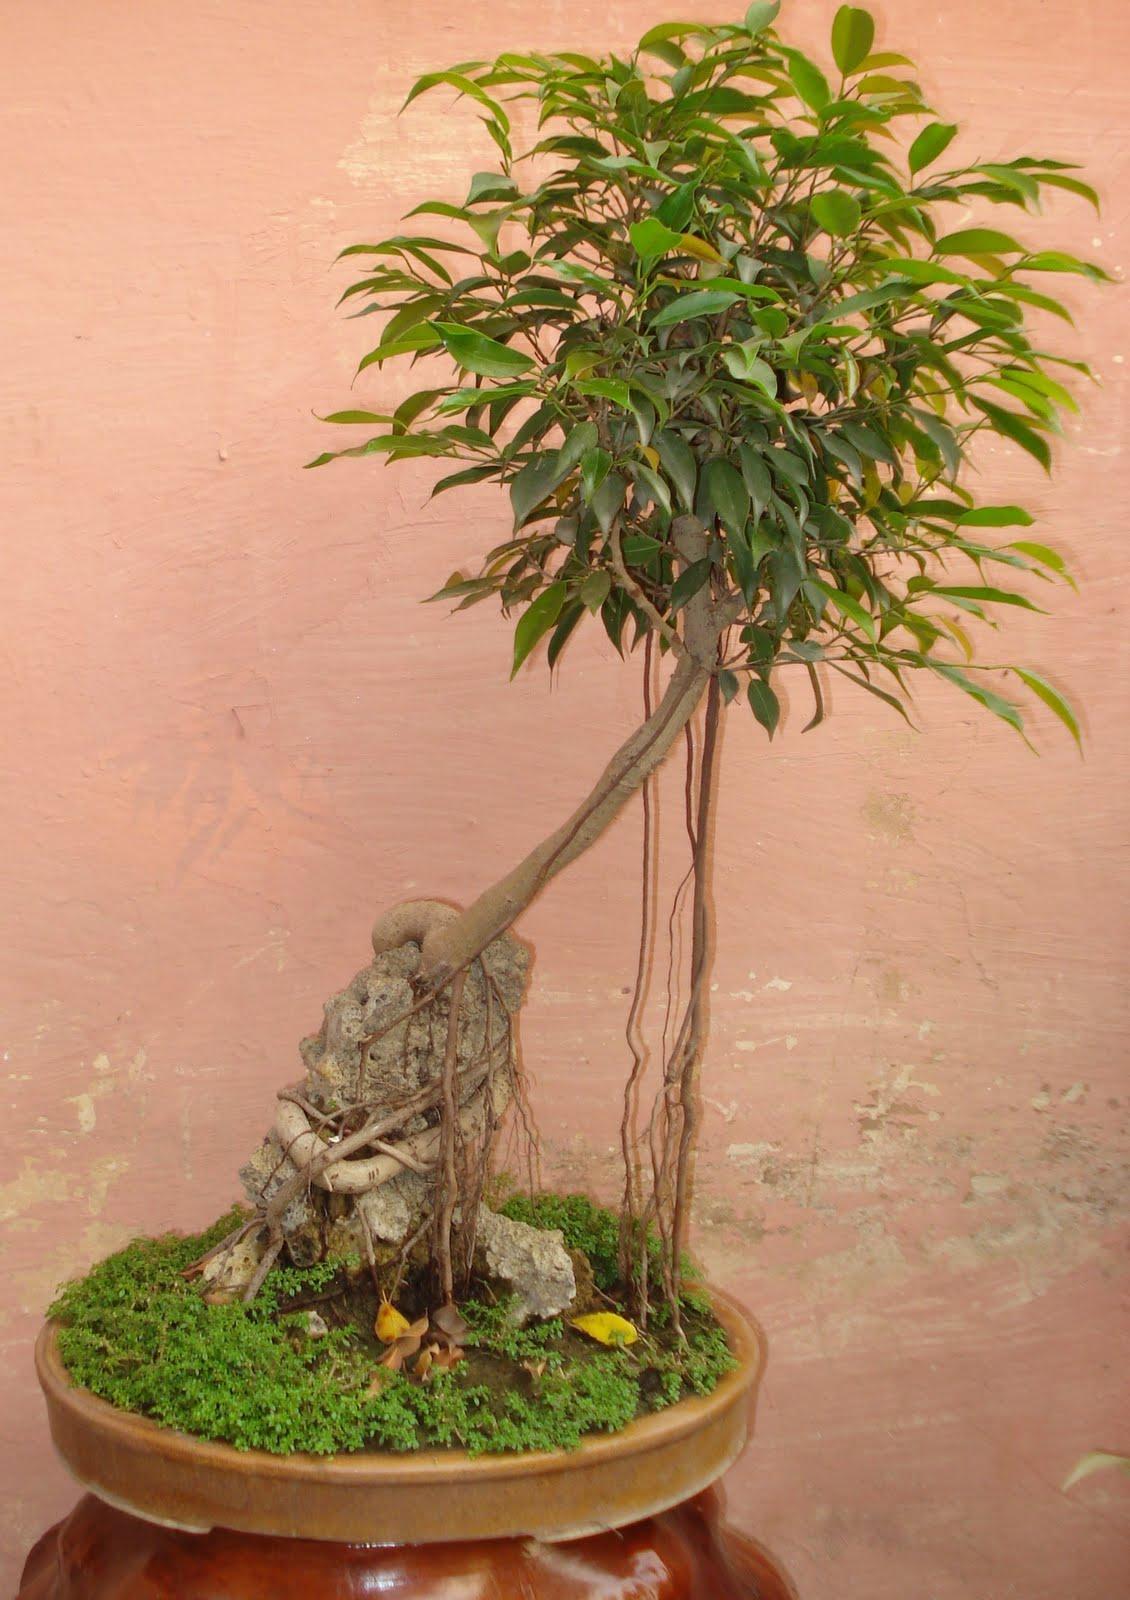 SUITABILITY OF FICUS FAMILY FOR BONSAIS BONSAIS PLANTS AS GIFTS